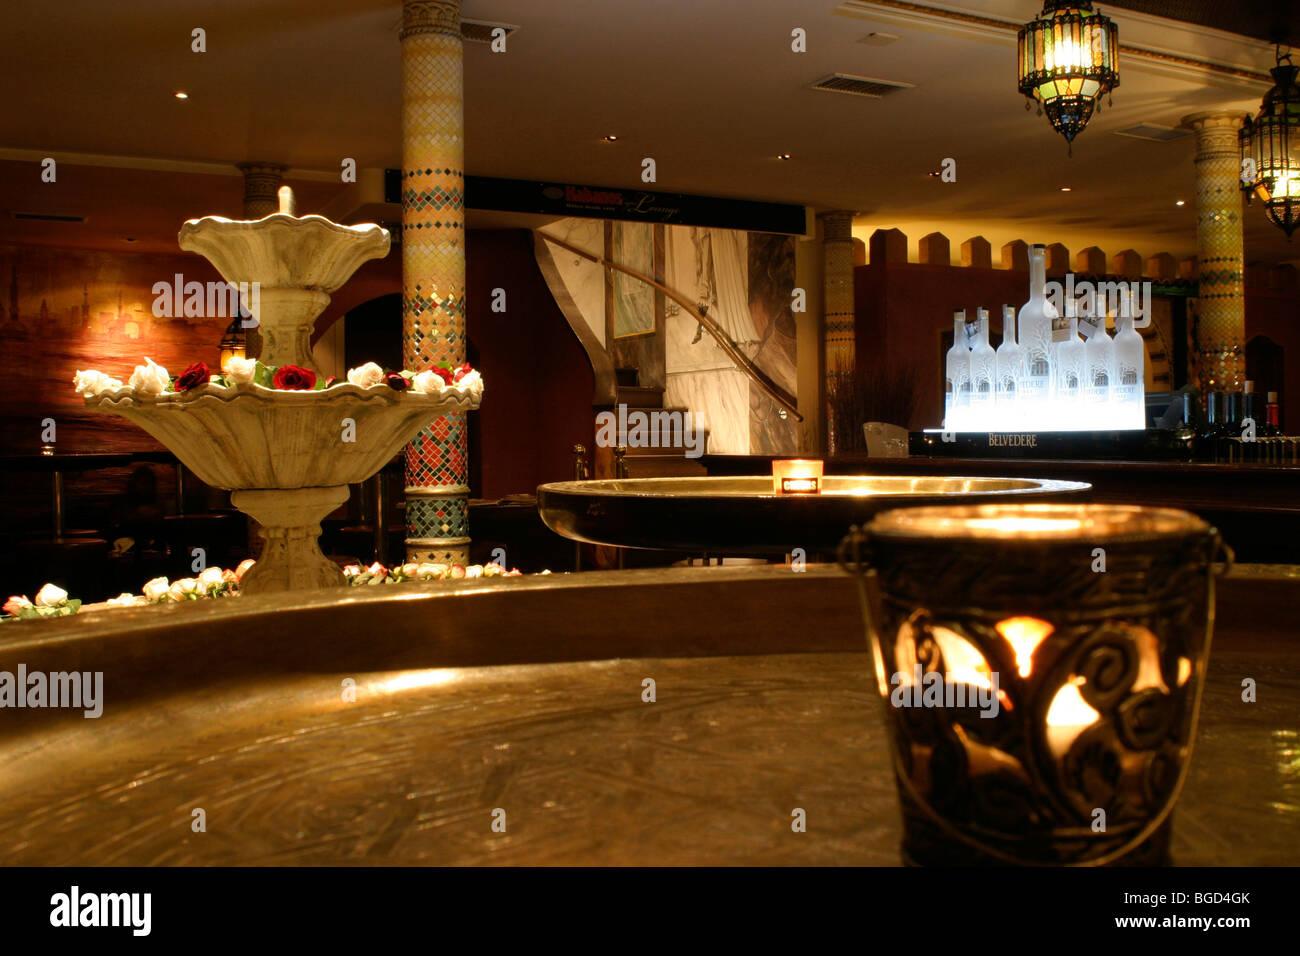 Lounge Bars Stockfotos & Lounge Bars Bilder - Alamy